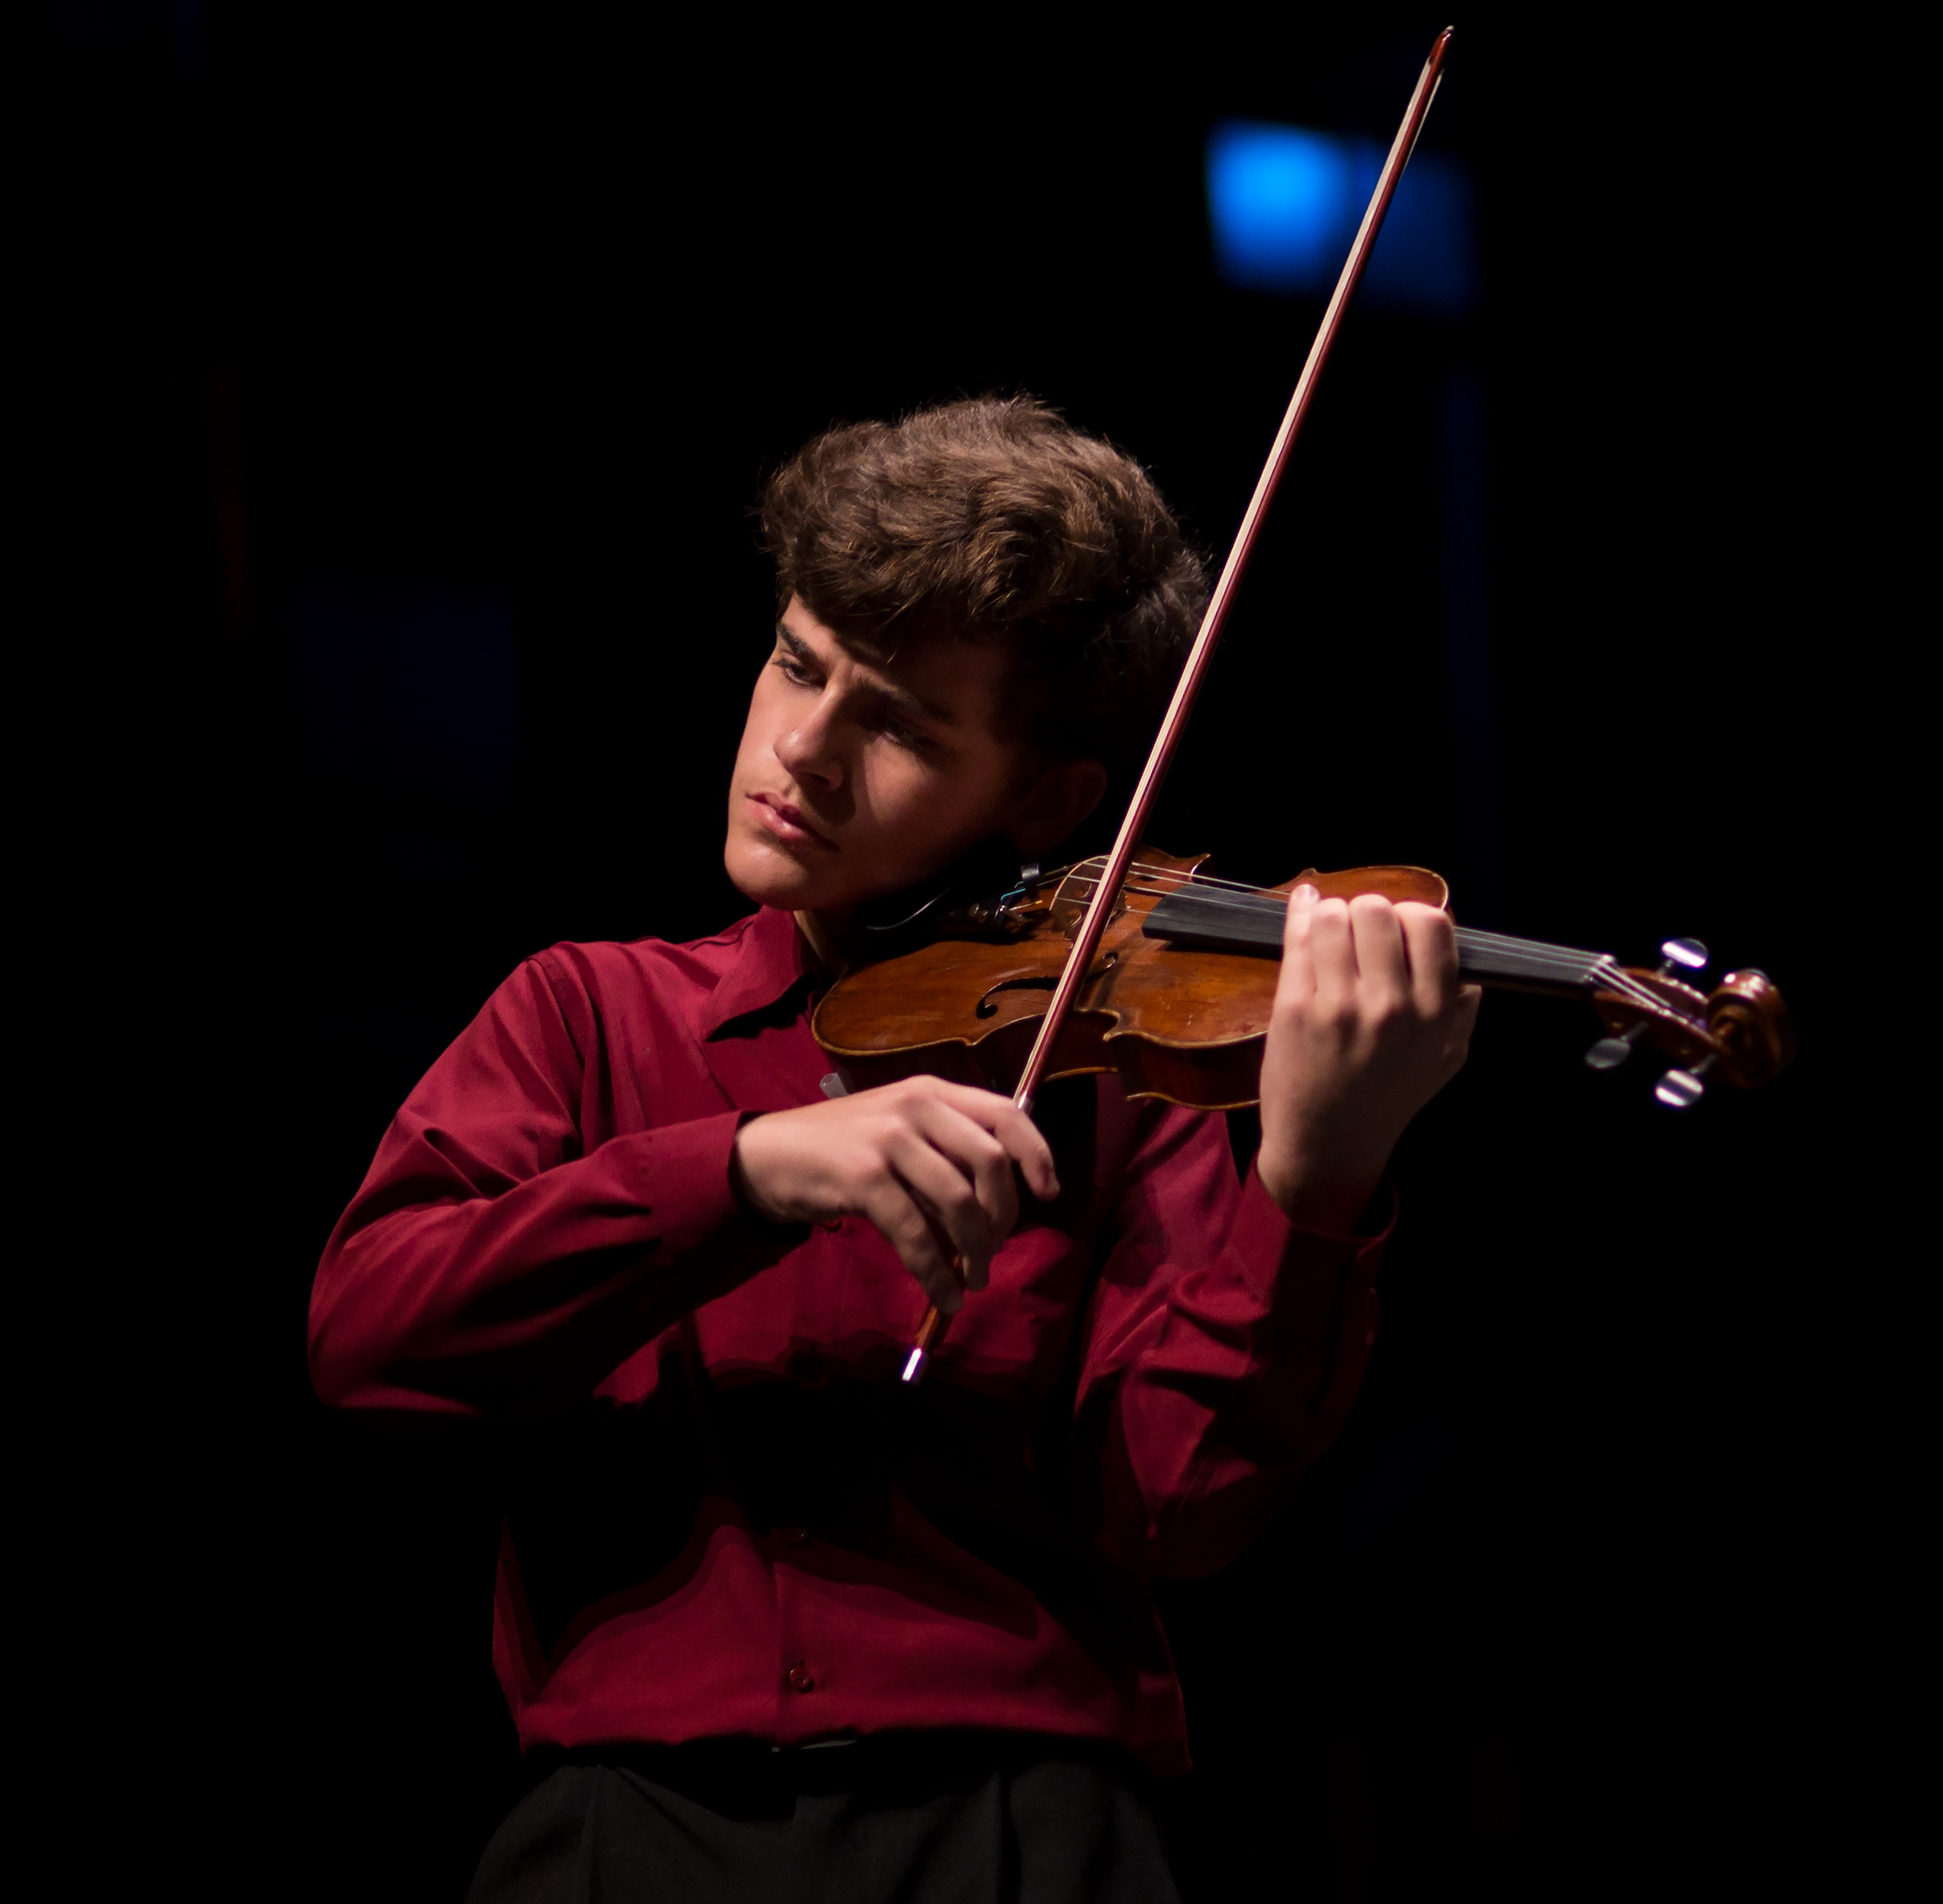 Menuhin Competition-3819 Guido Sant'Anna, Brazil, 12.jpg